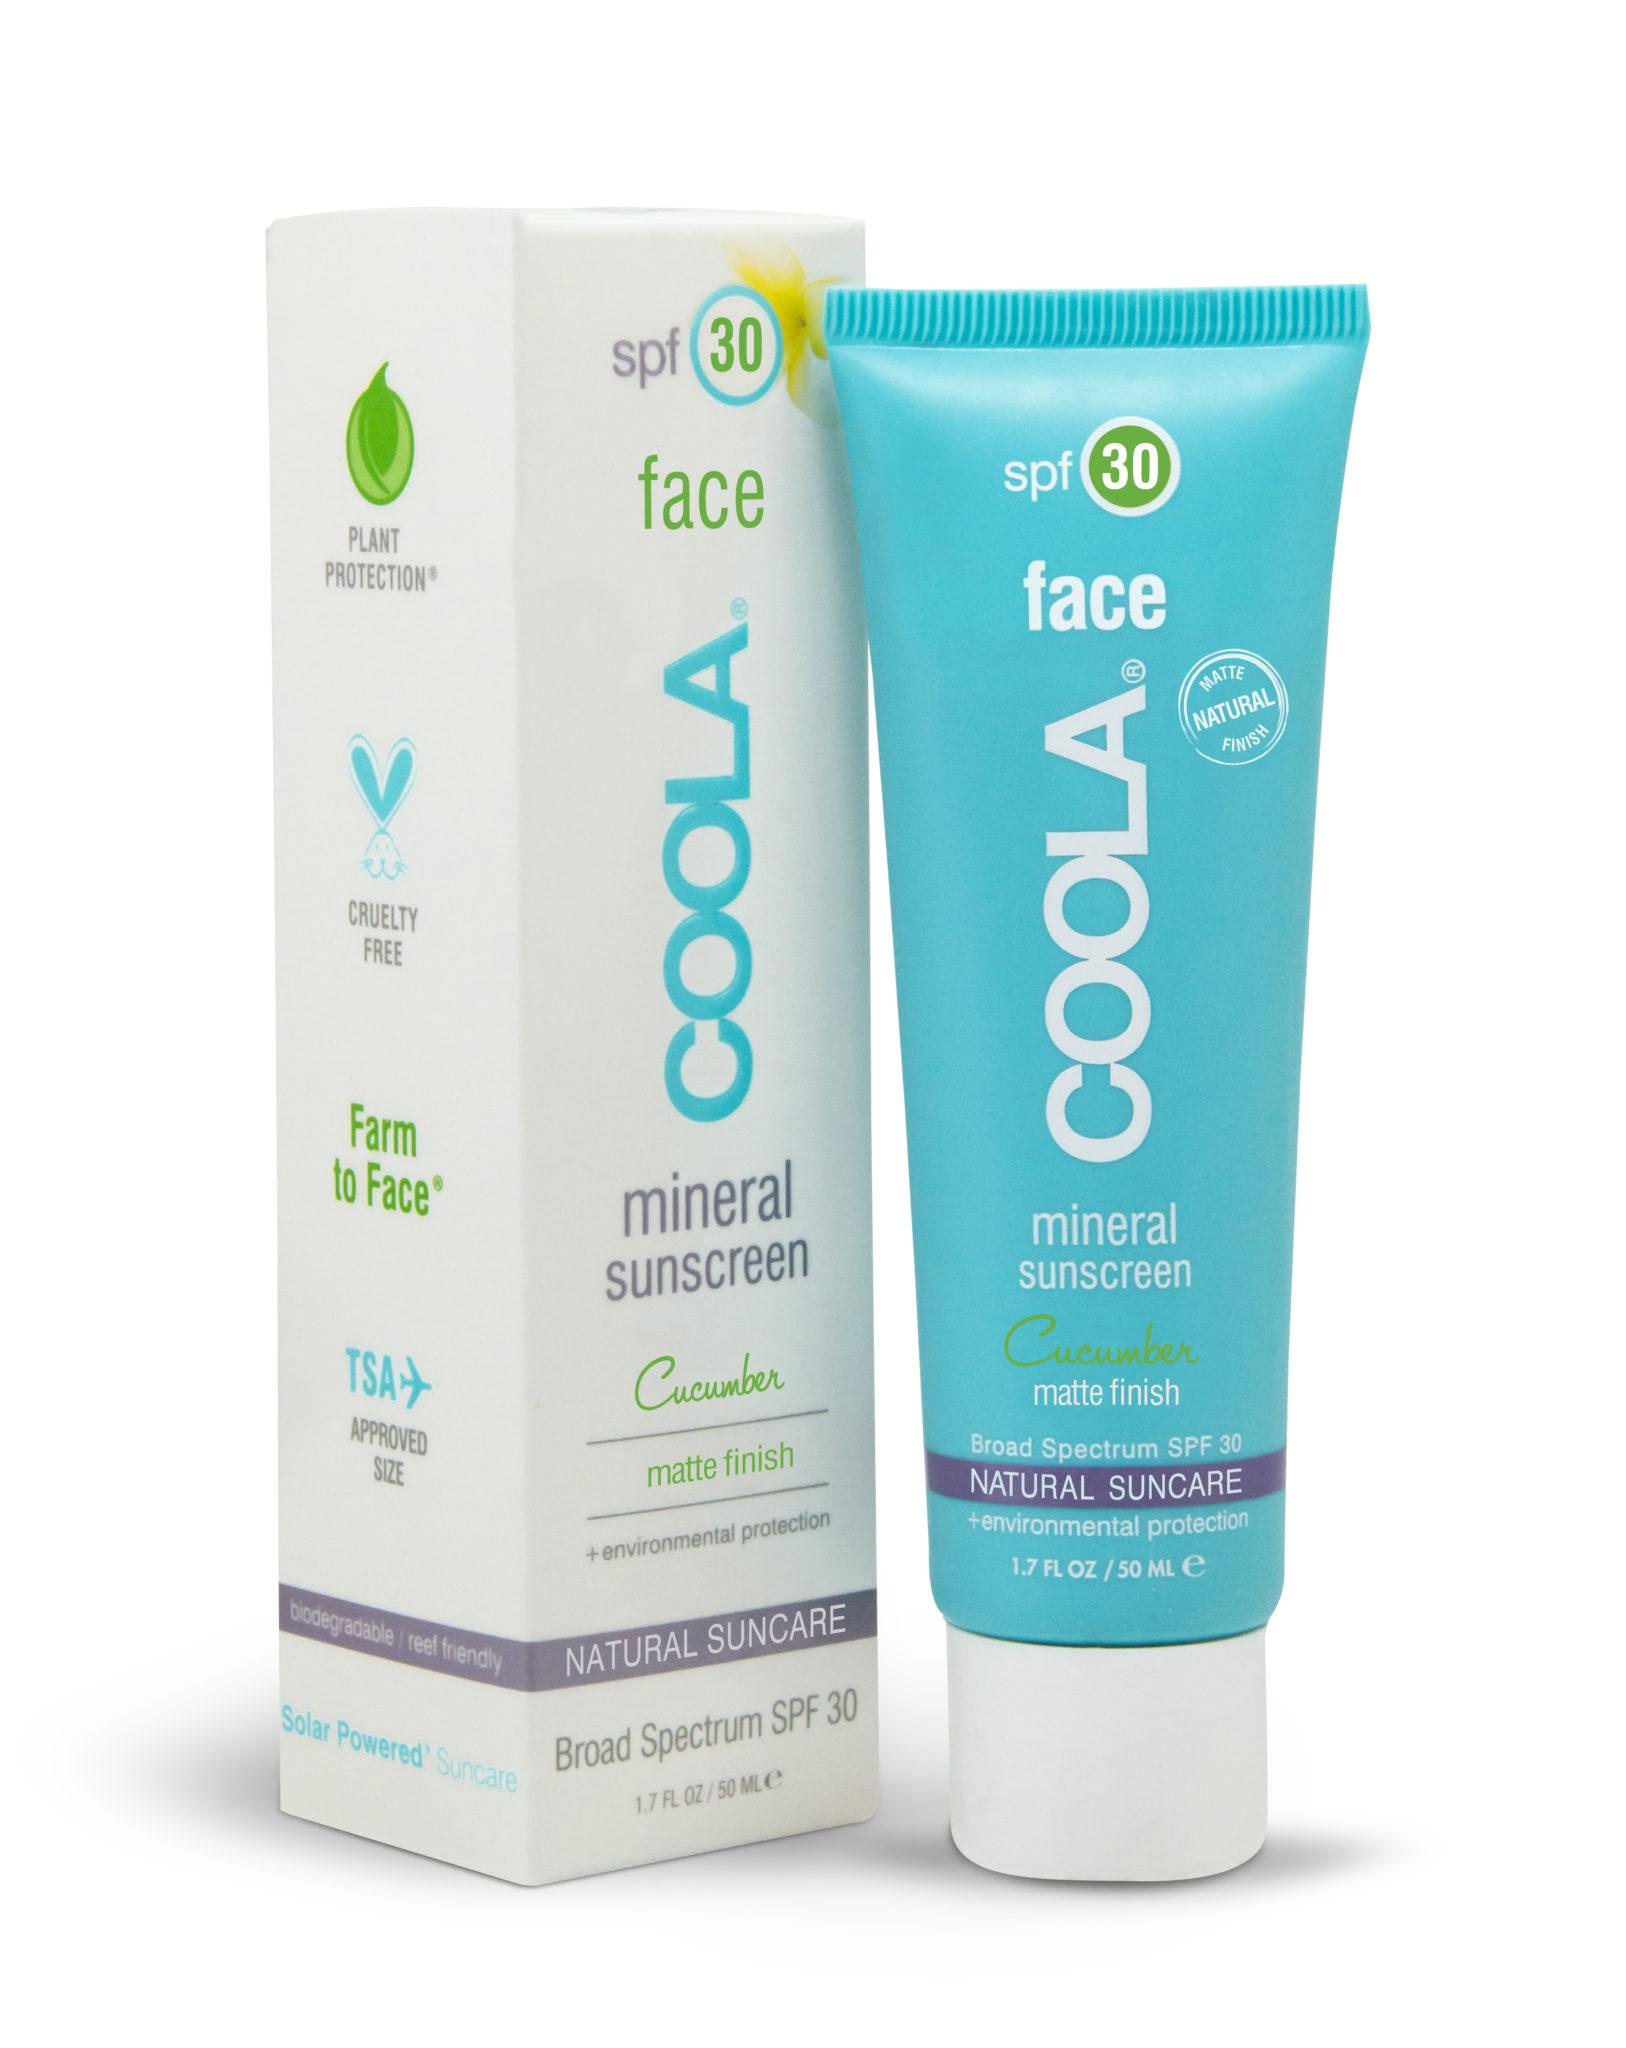 COOLA Mineral Face SPF 30 Cucumber Matte Finish